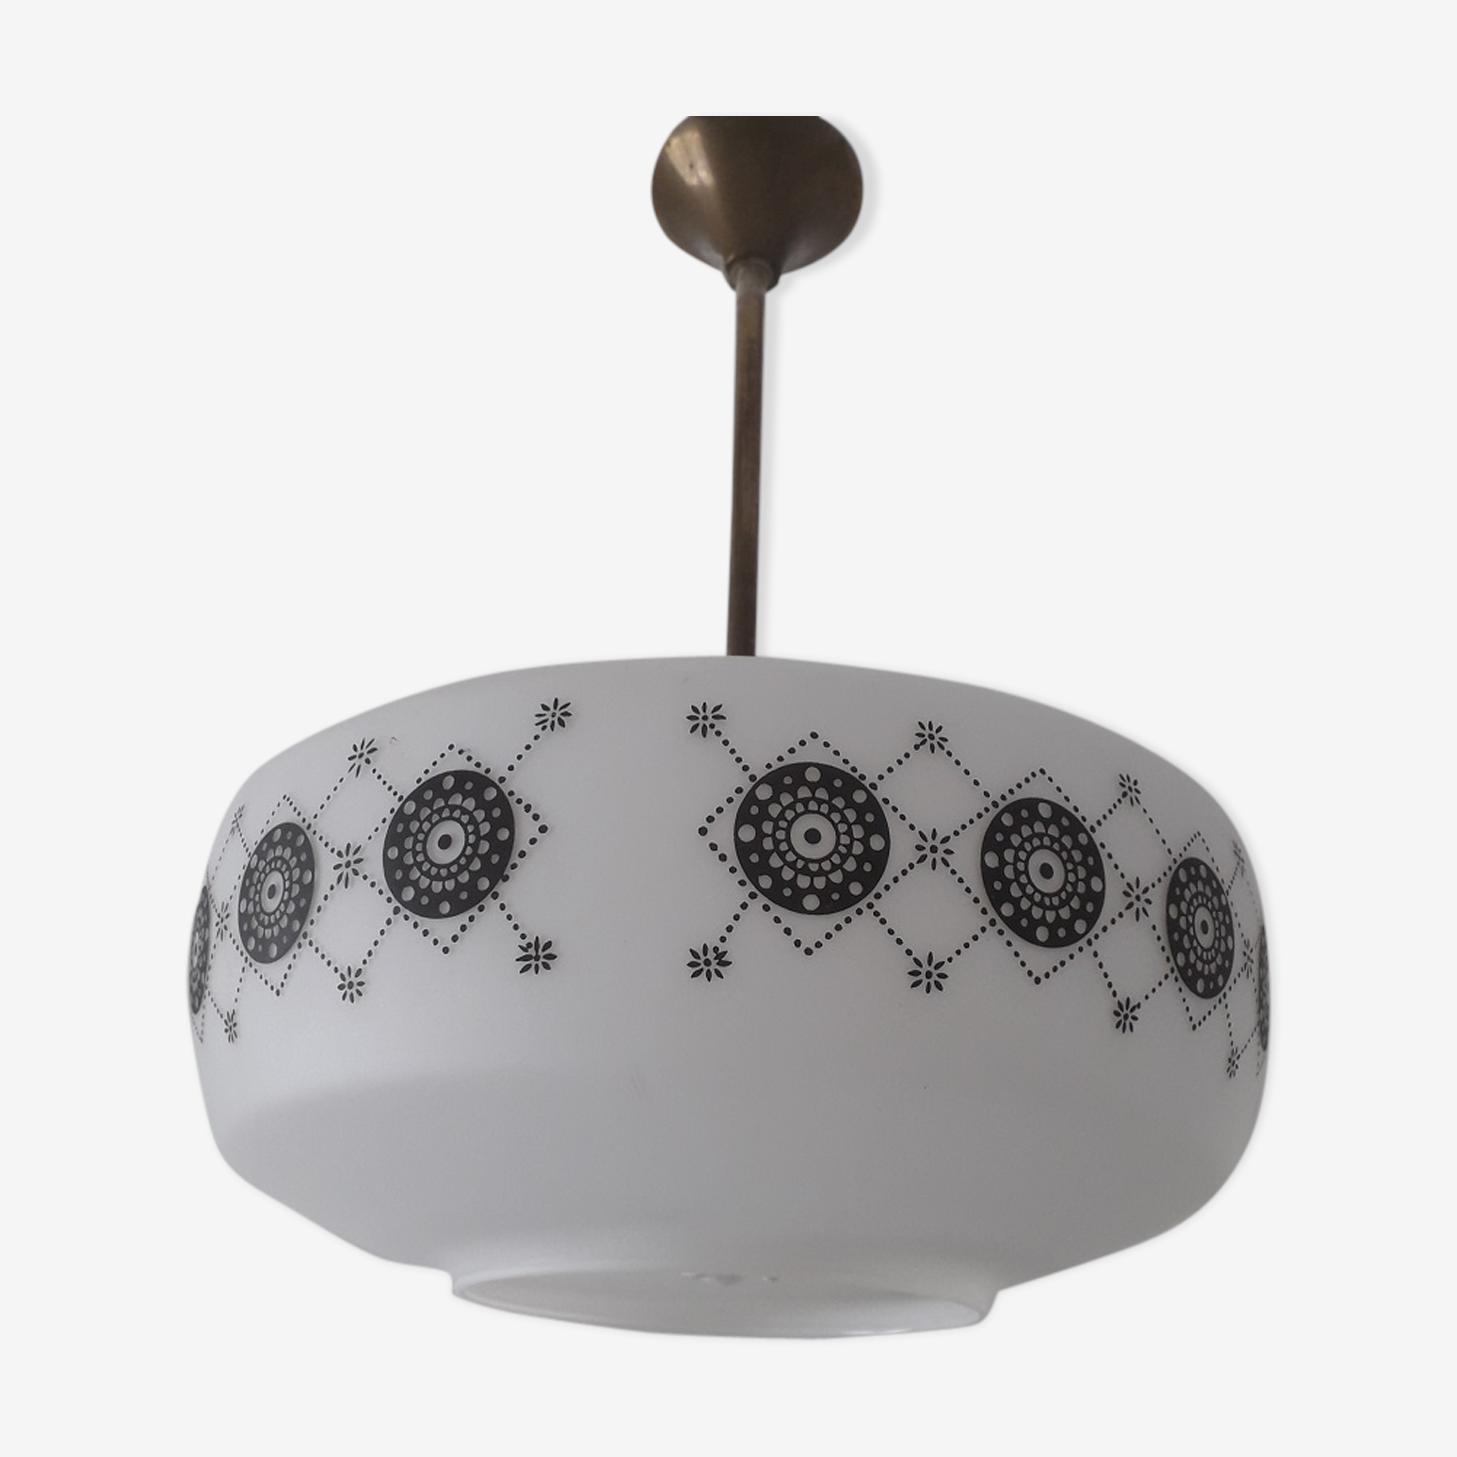 Pendant white opaline chandelier and design black motifs